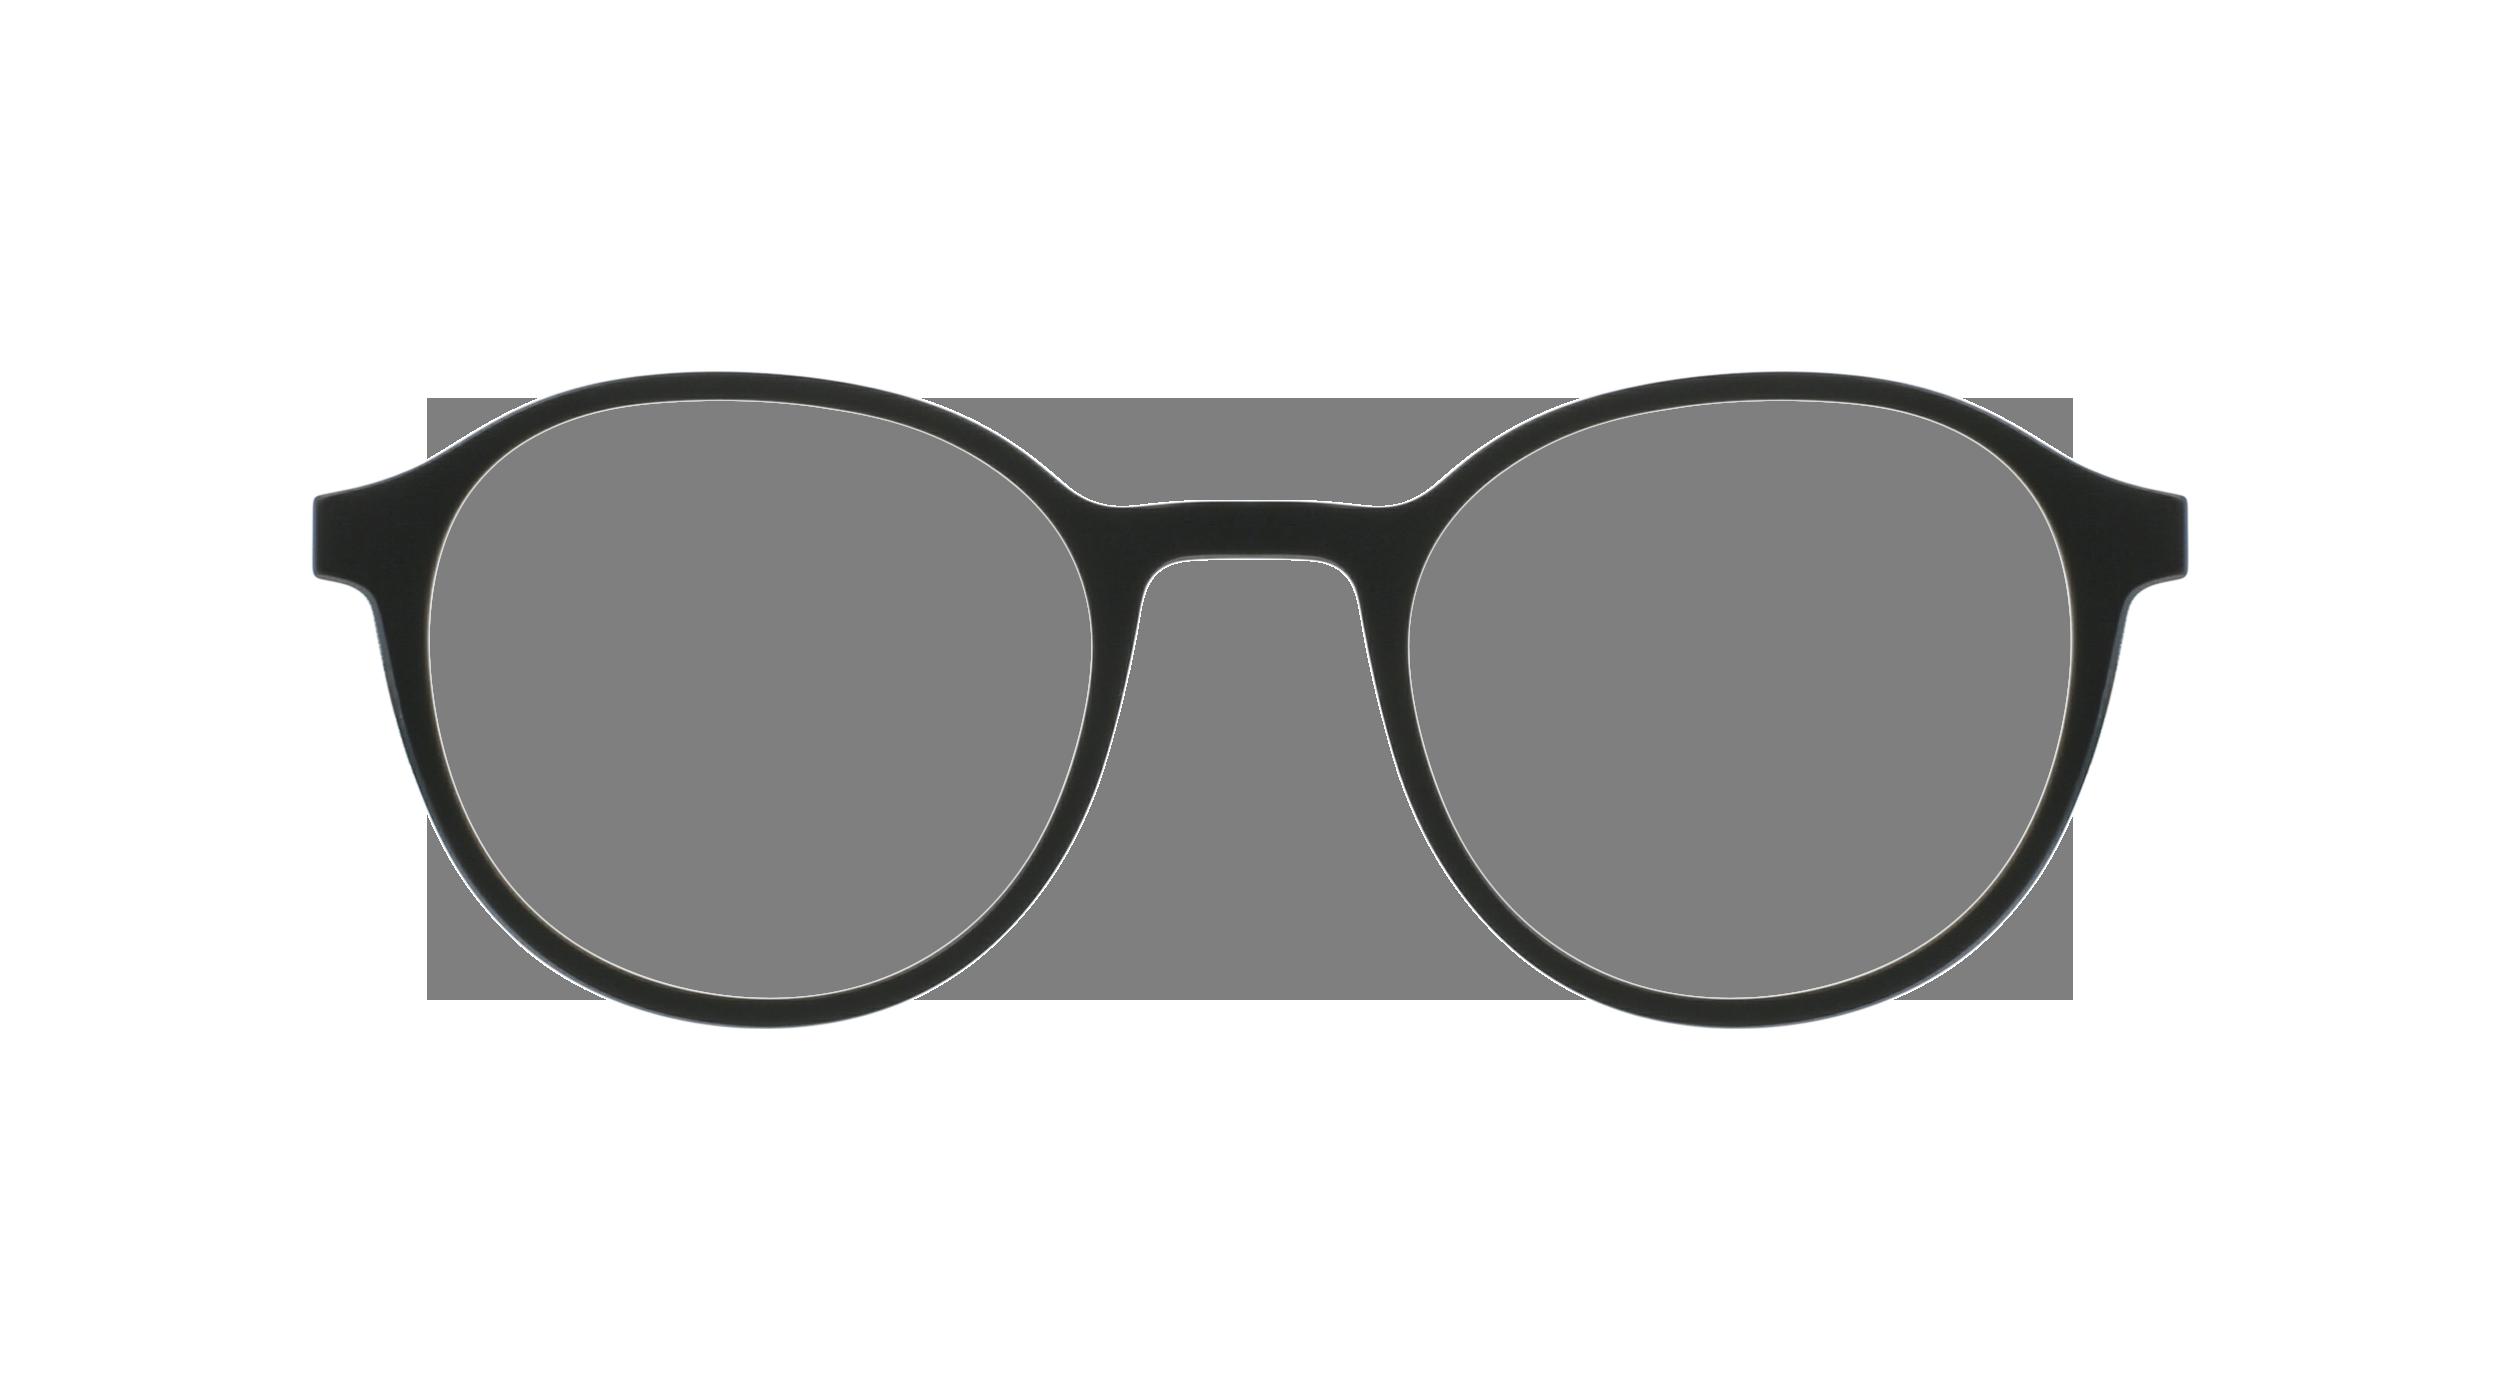 afflelou/france/products/smart_clip/clips_glasses/07630036458723.png